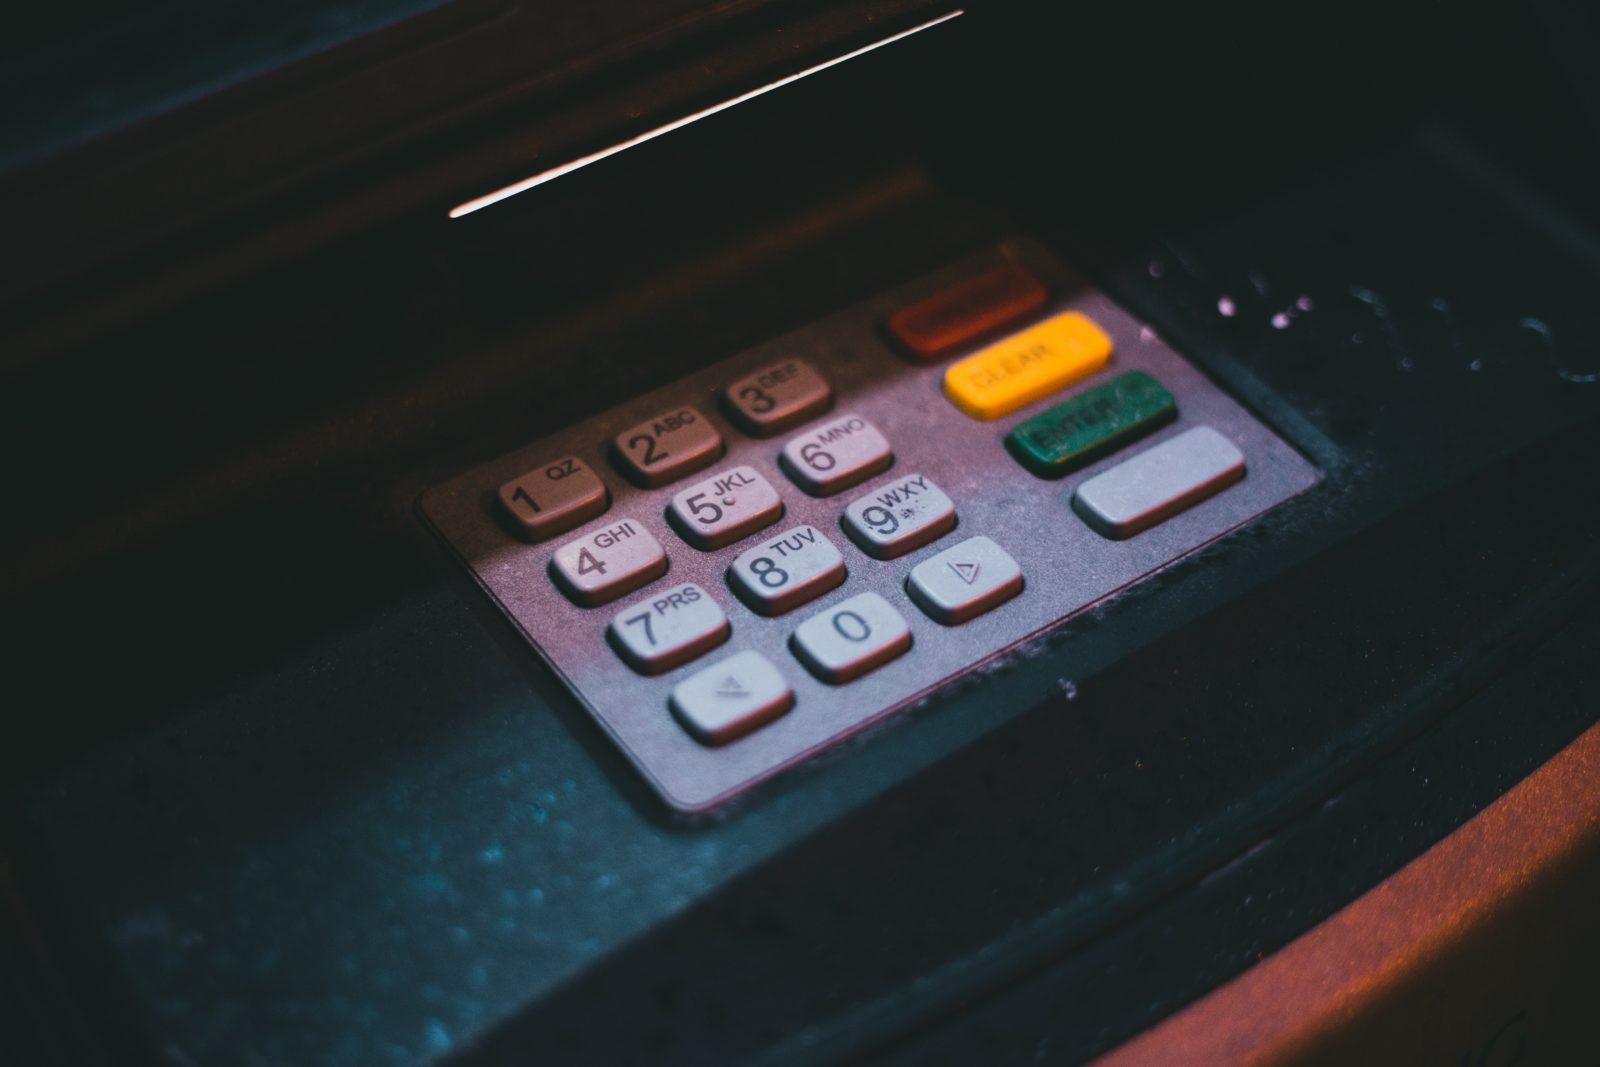 fundraising campaign + calculator